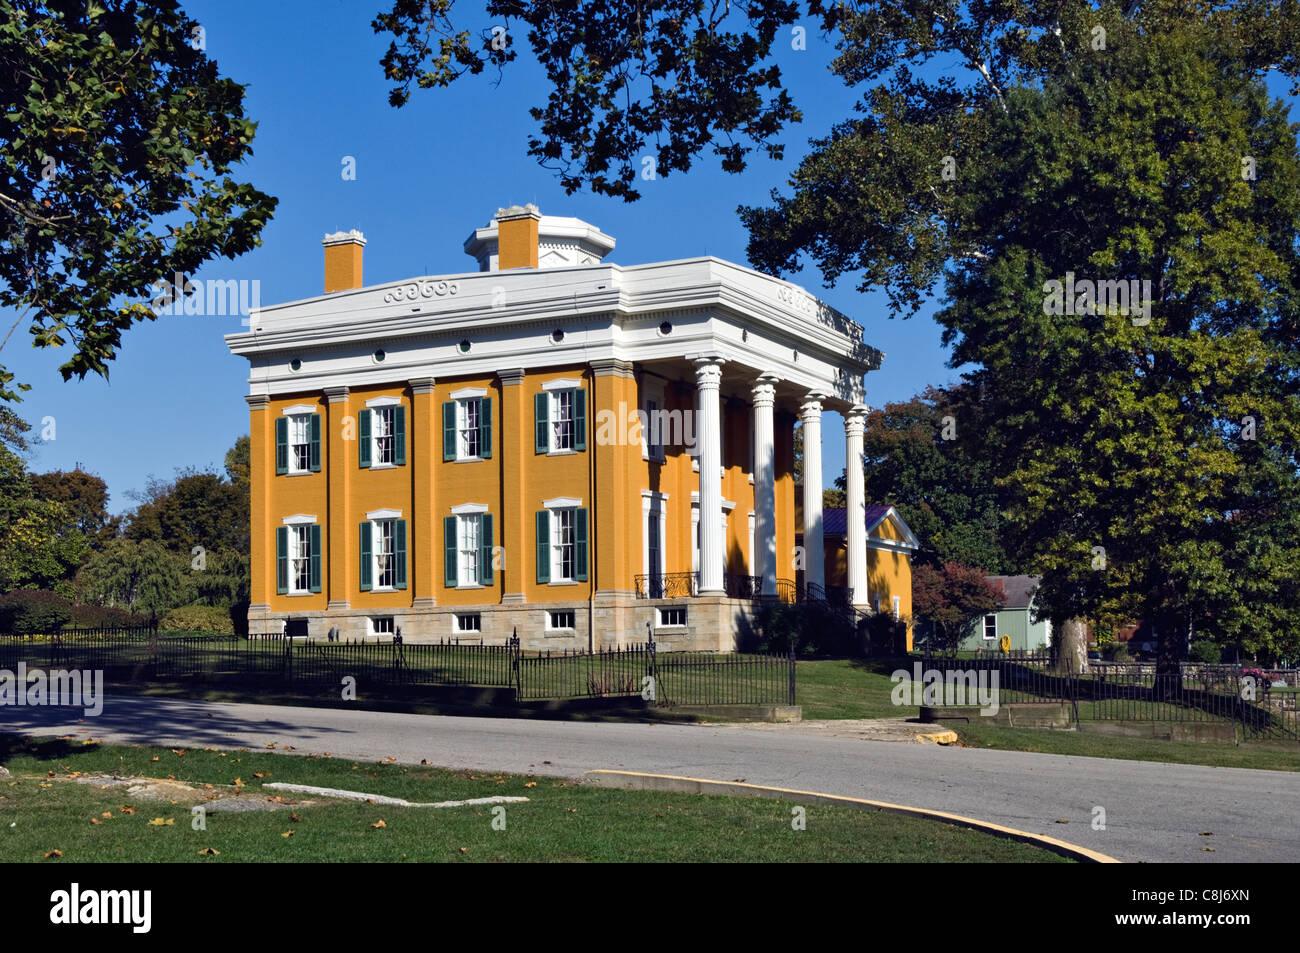 Lanier Mansion in Madison, Indiana - Stock Image